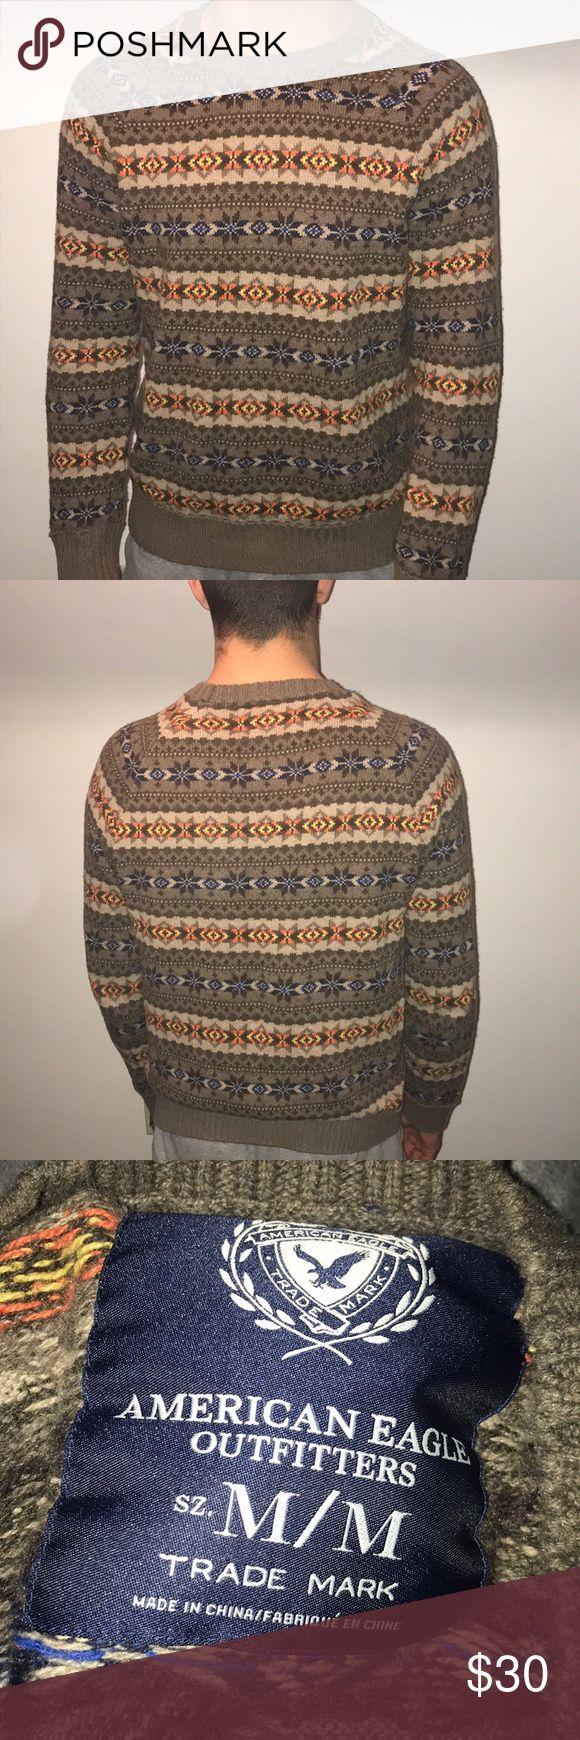 American eagle men's sweater * American eagle * size medium * made in China *60% cotton, 35% nylon, 5% rabbit hair American Eagle Outfitters Sweaters Crewneck